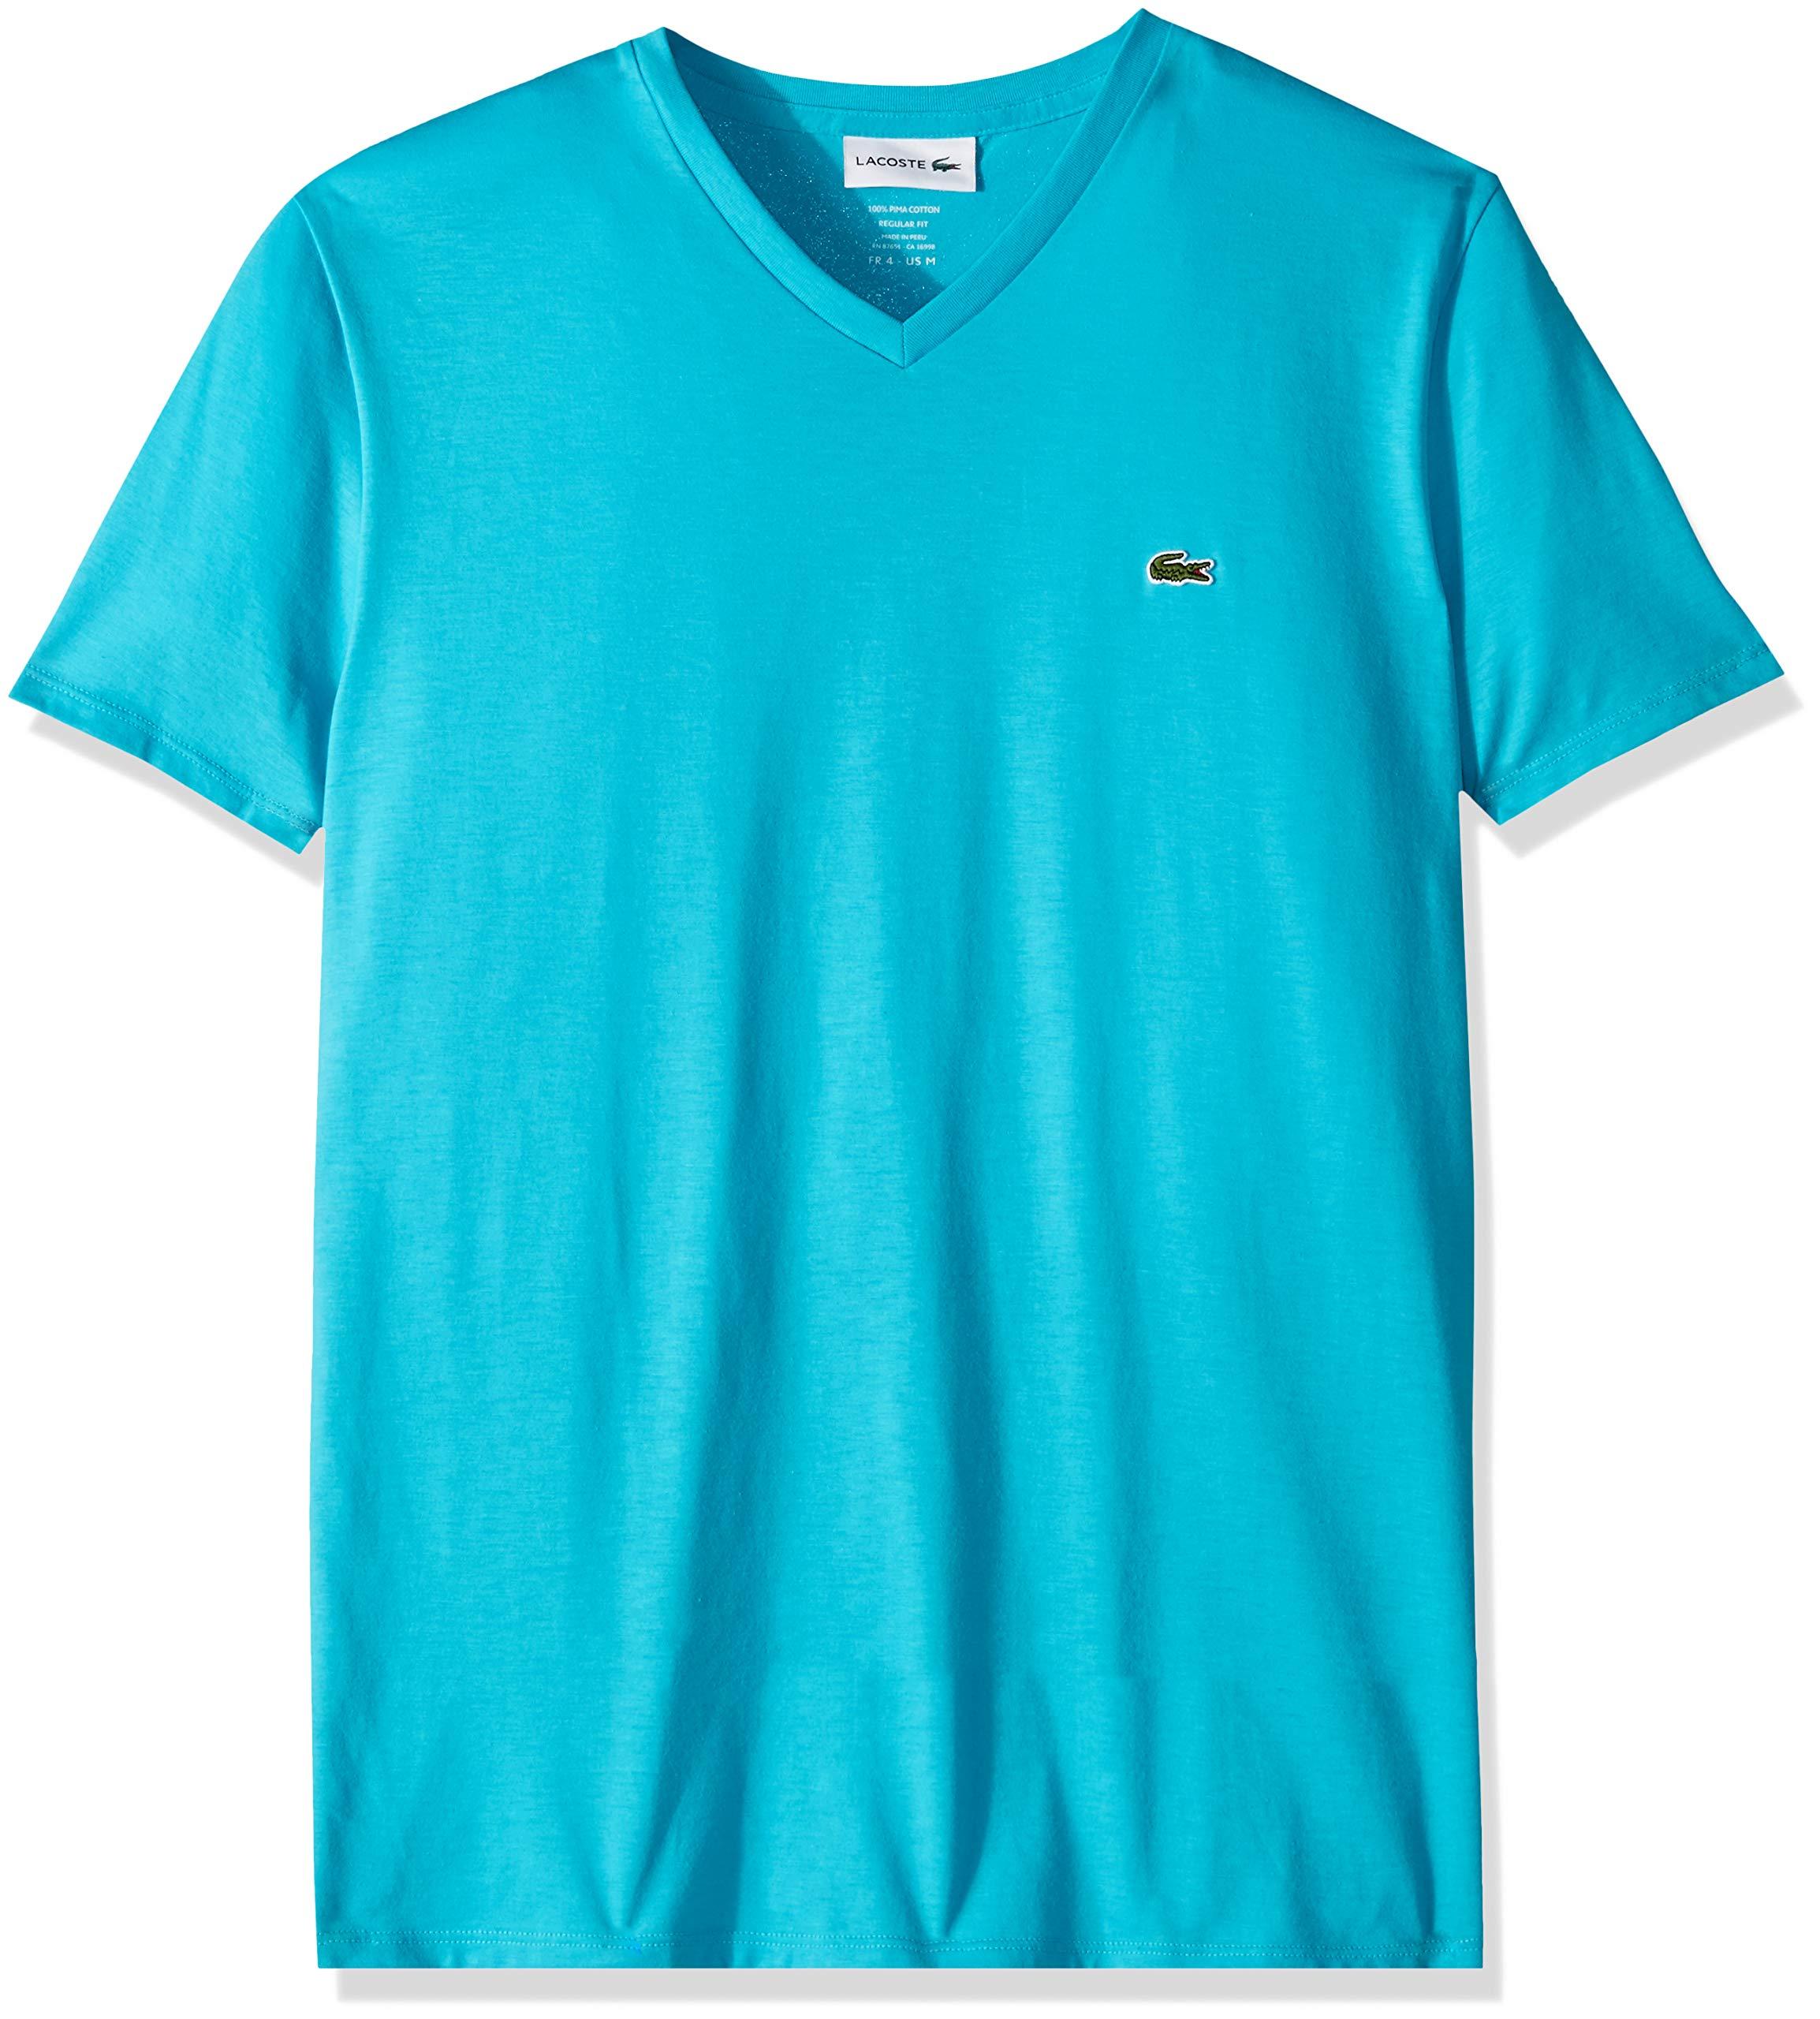 Lacoste Men's Short Sleeve V-Neck Pima Cotton